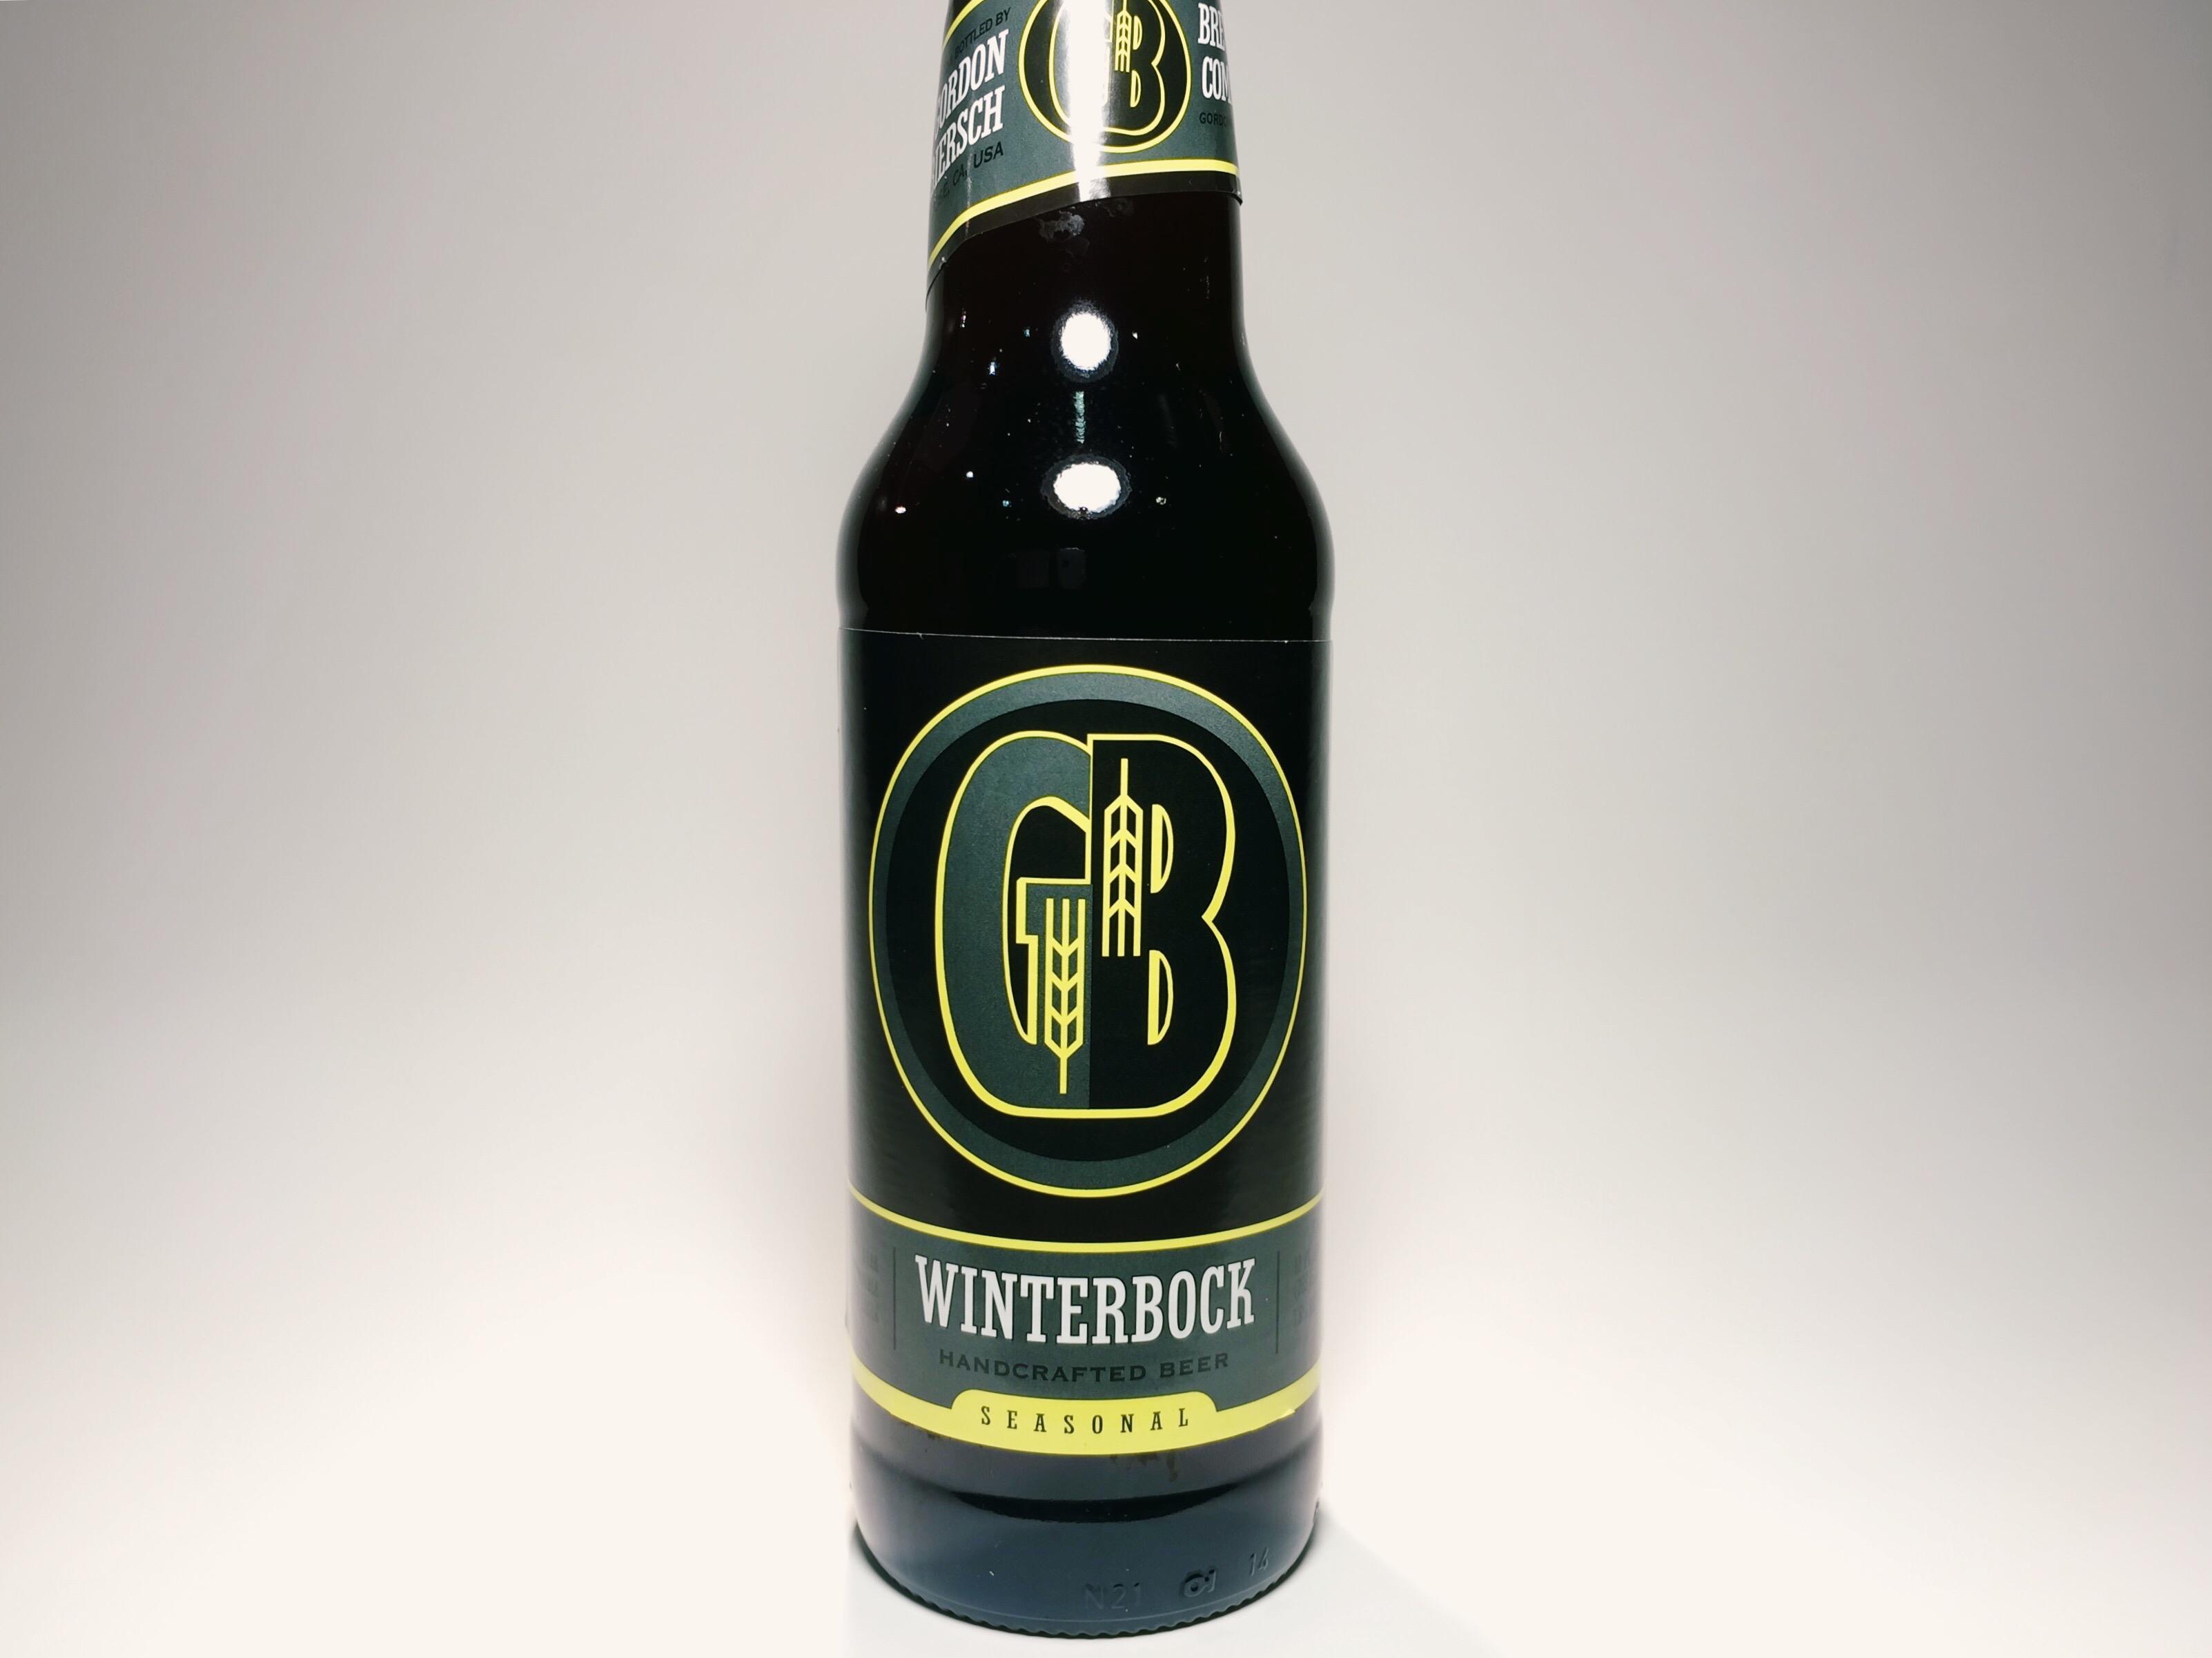 GB Winterbock